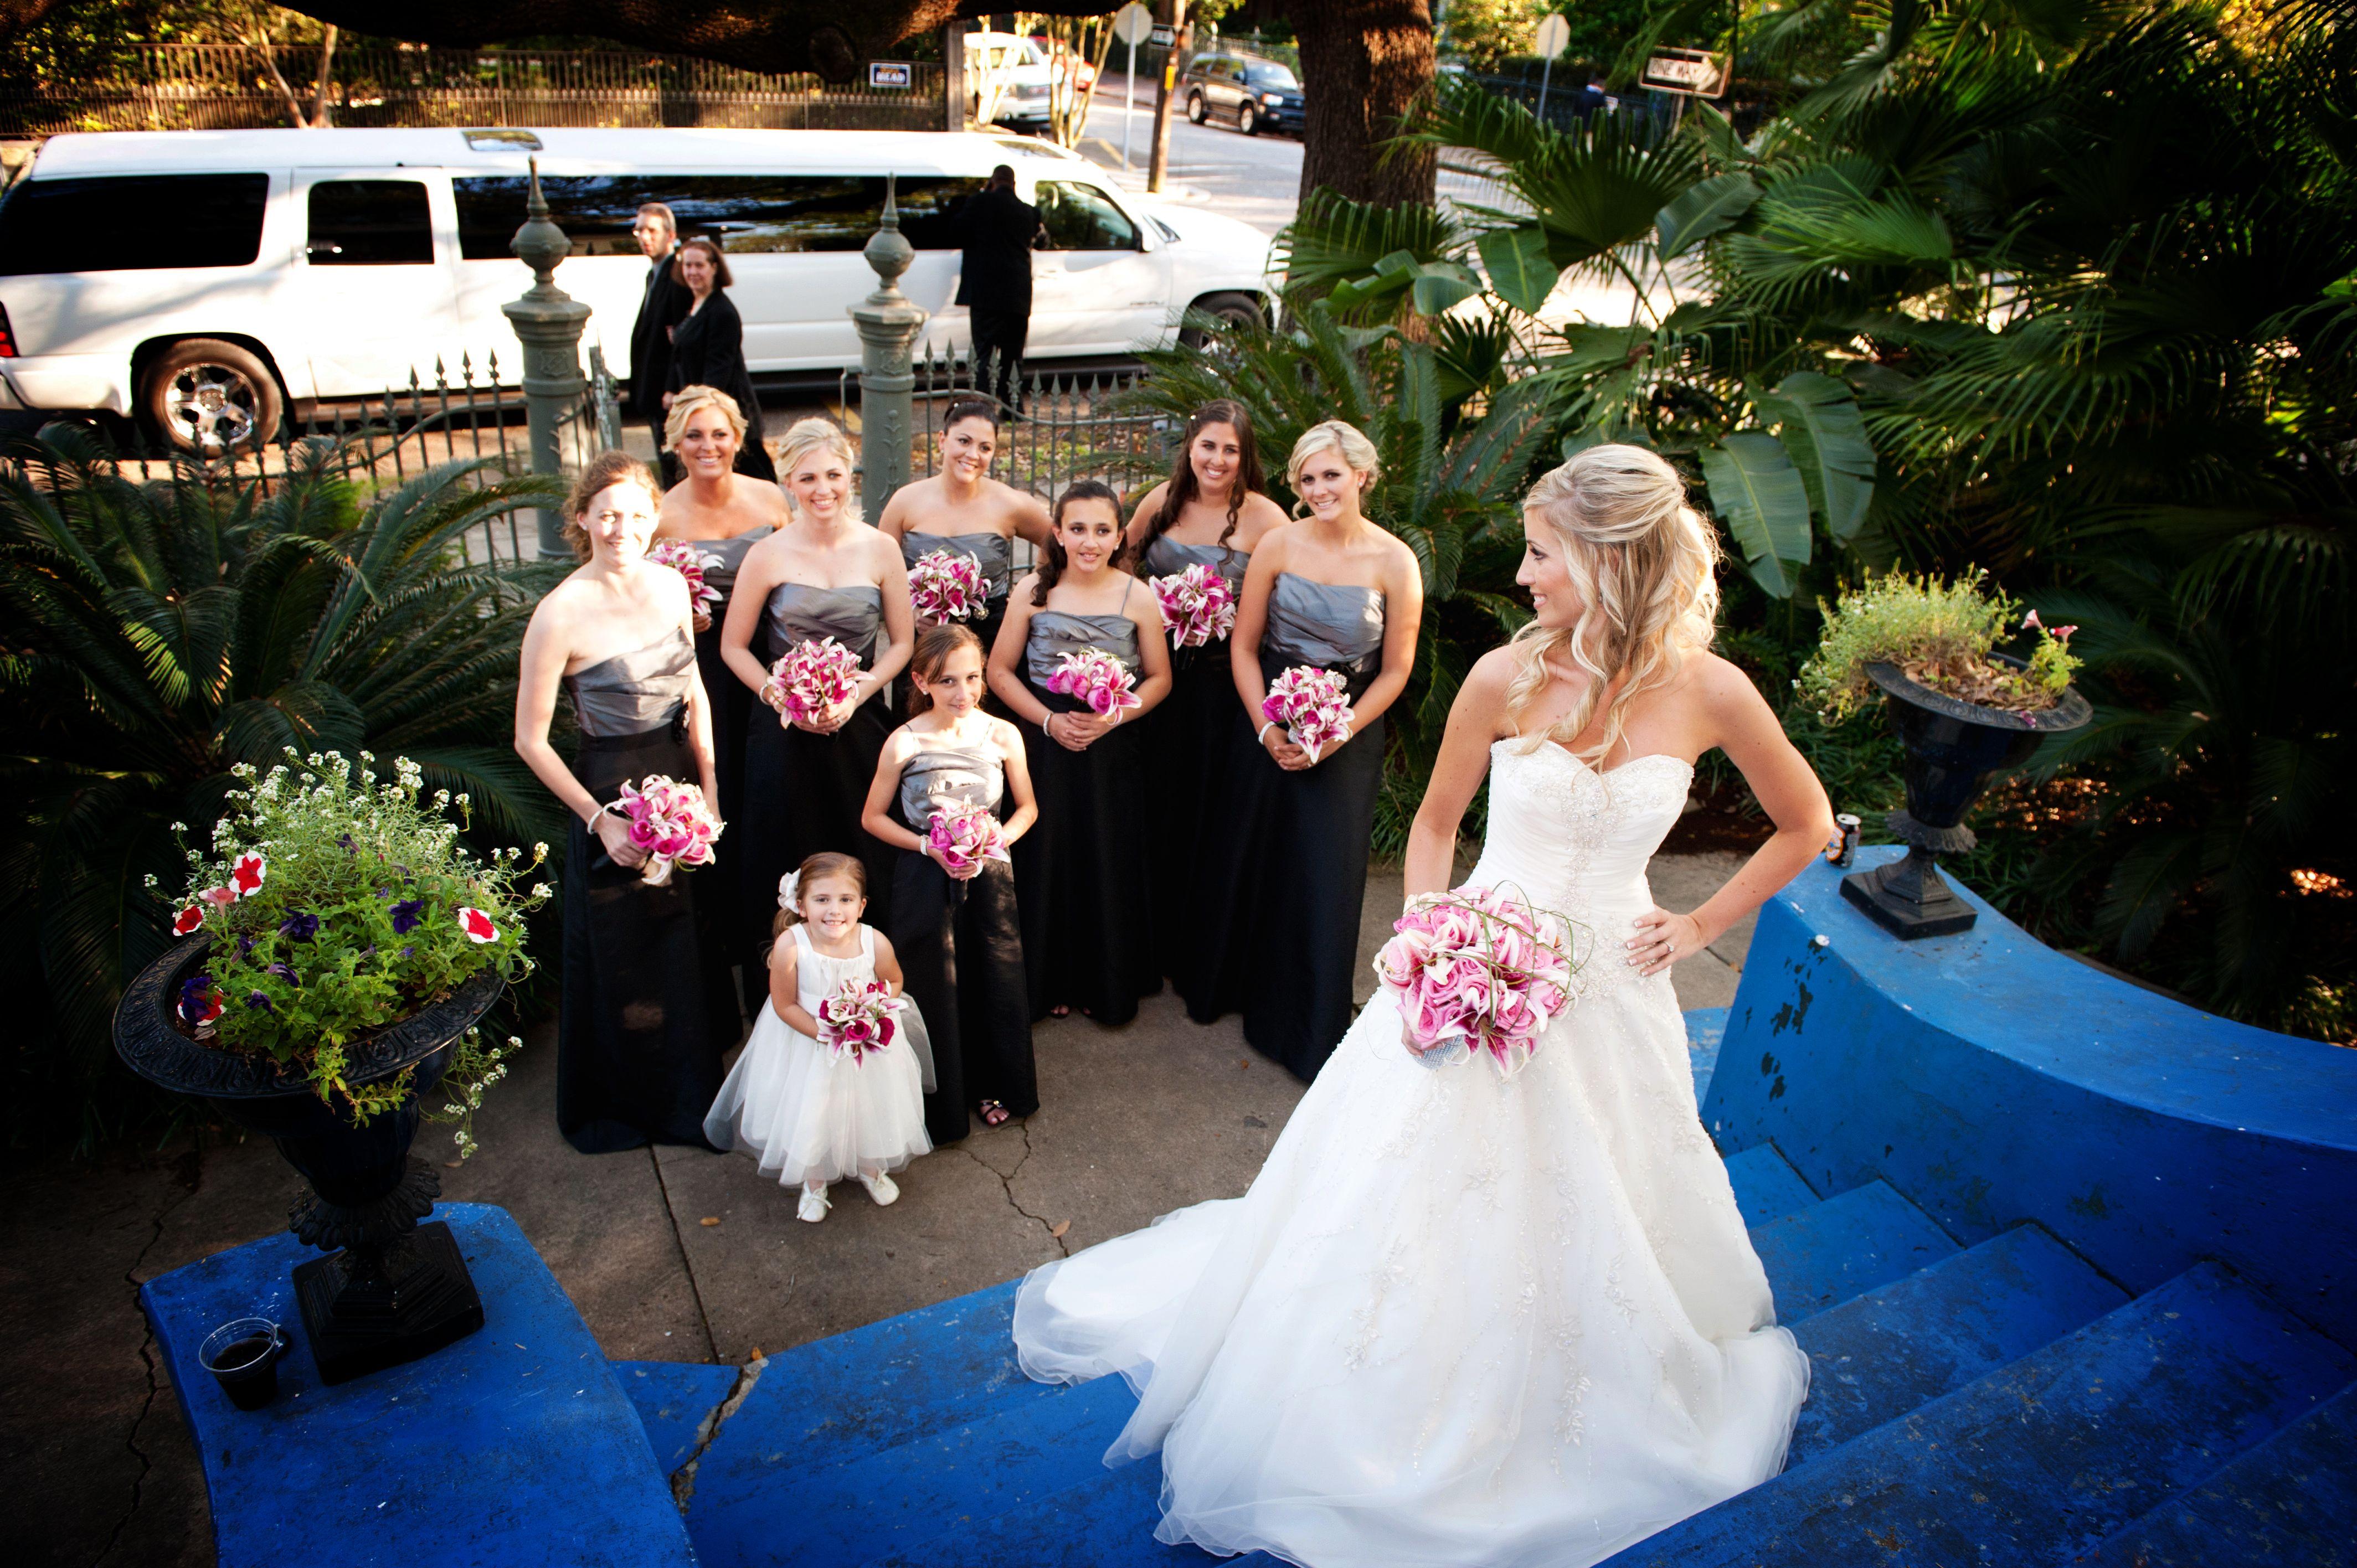 Wedding venues new orleans garden district